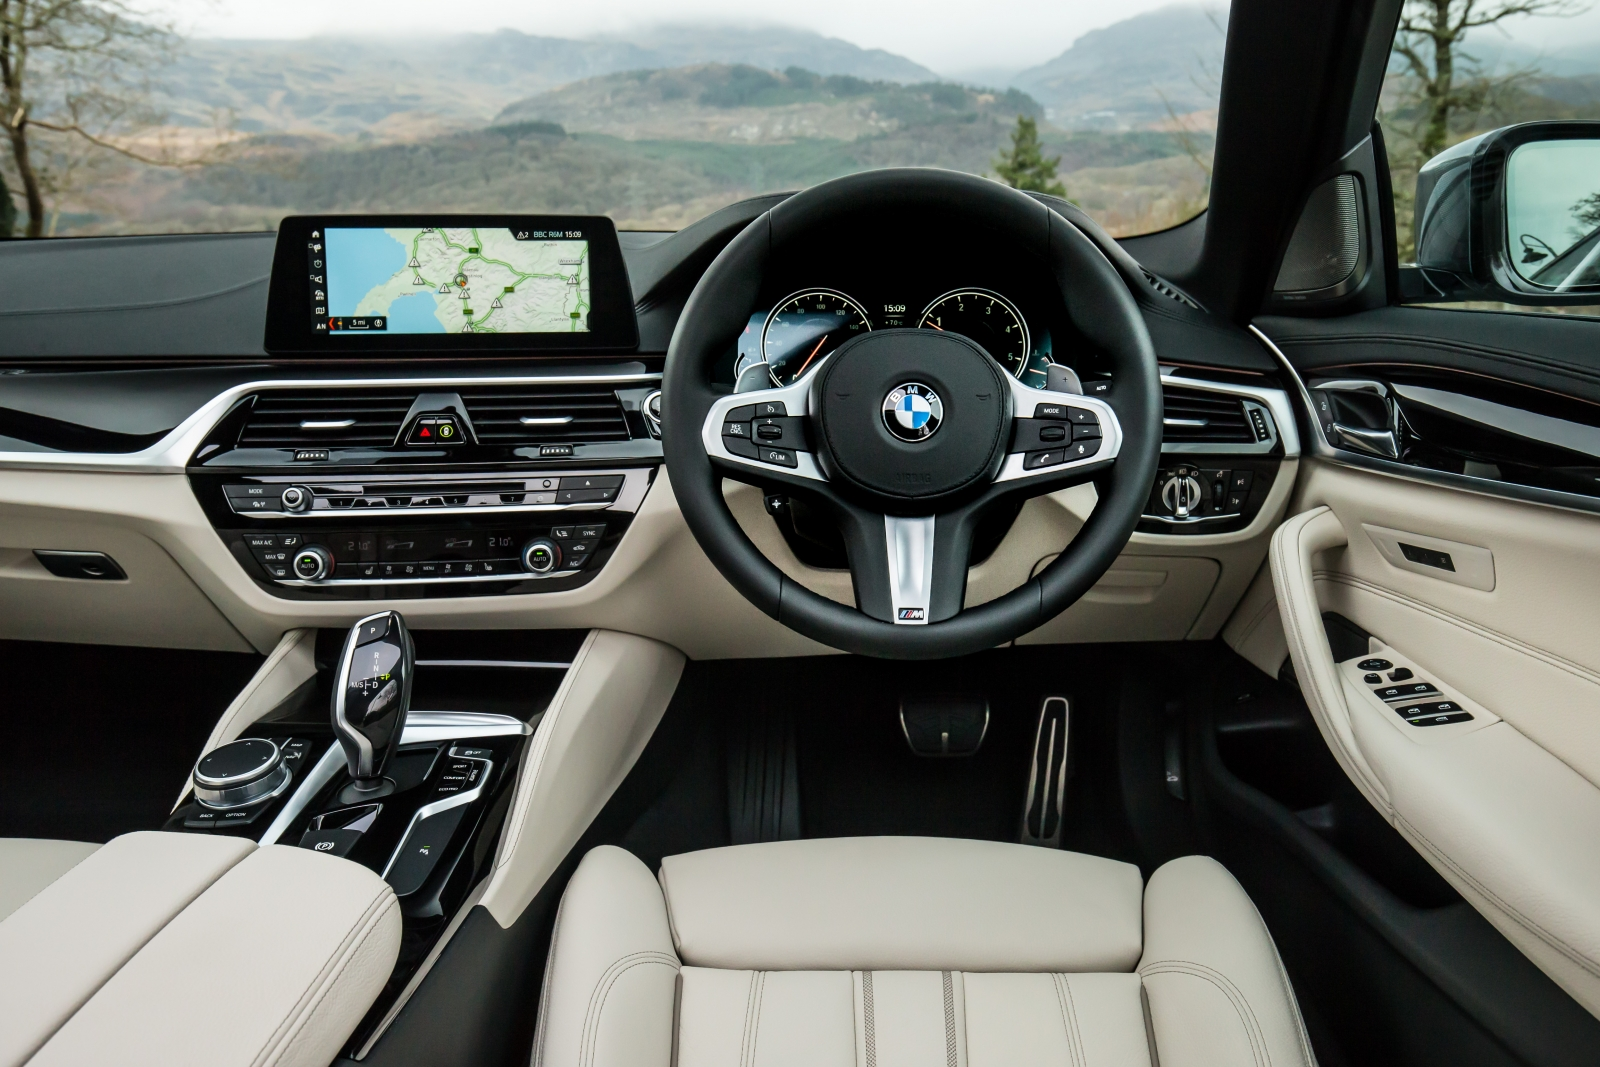 BMW 5-Series (2017) 530d M Sport interior